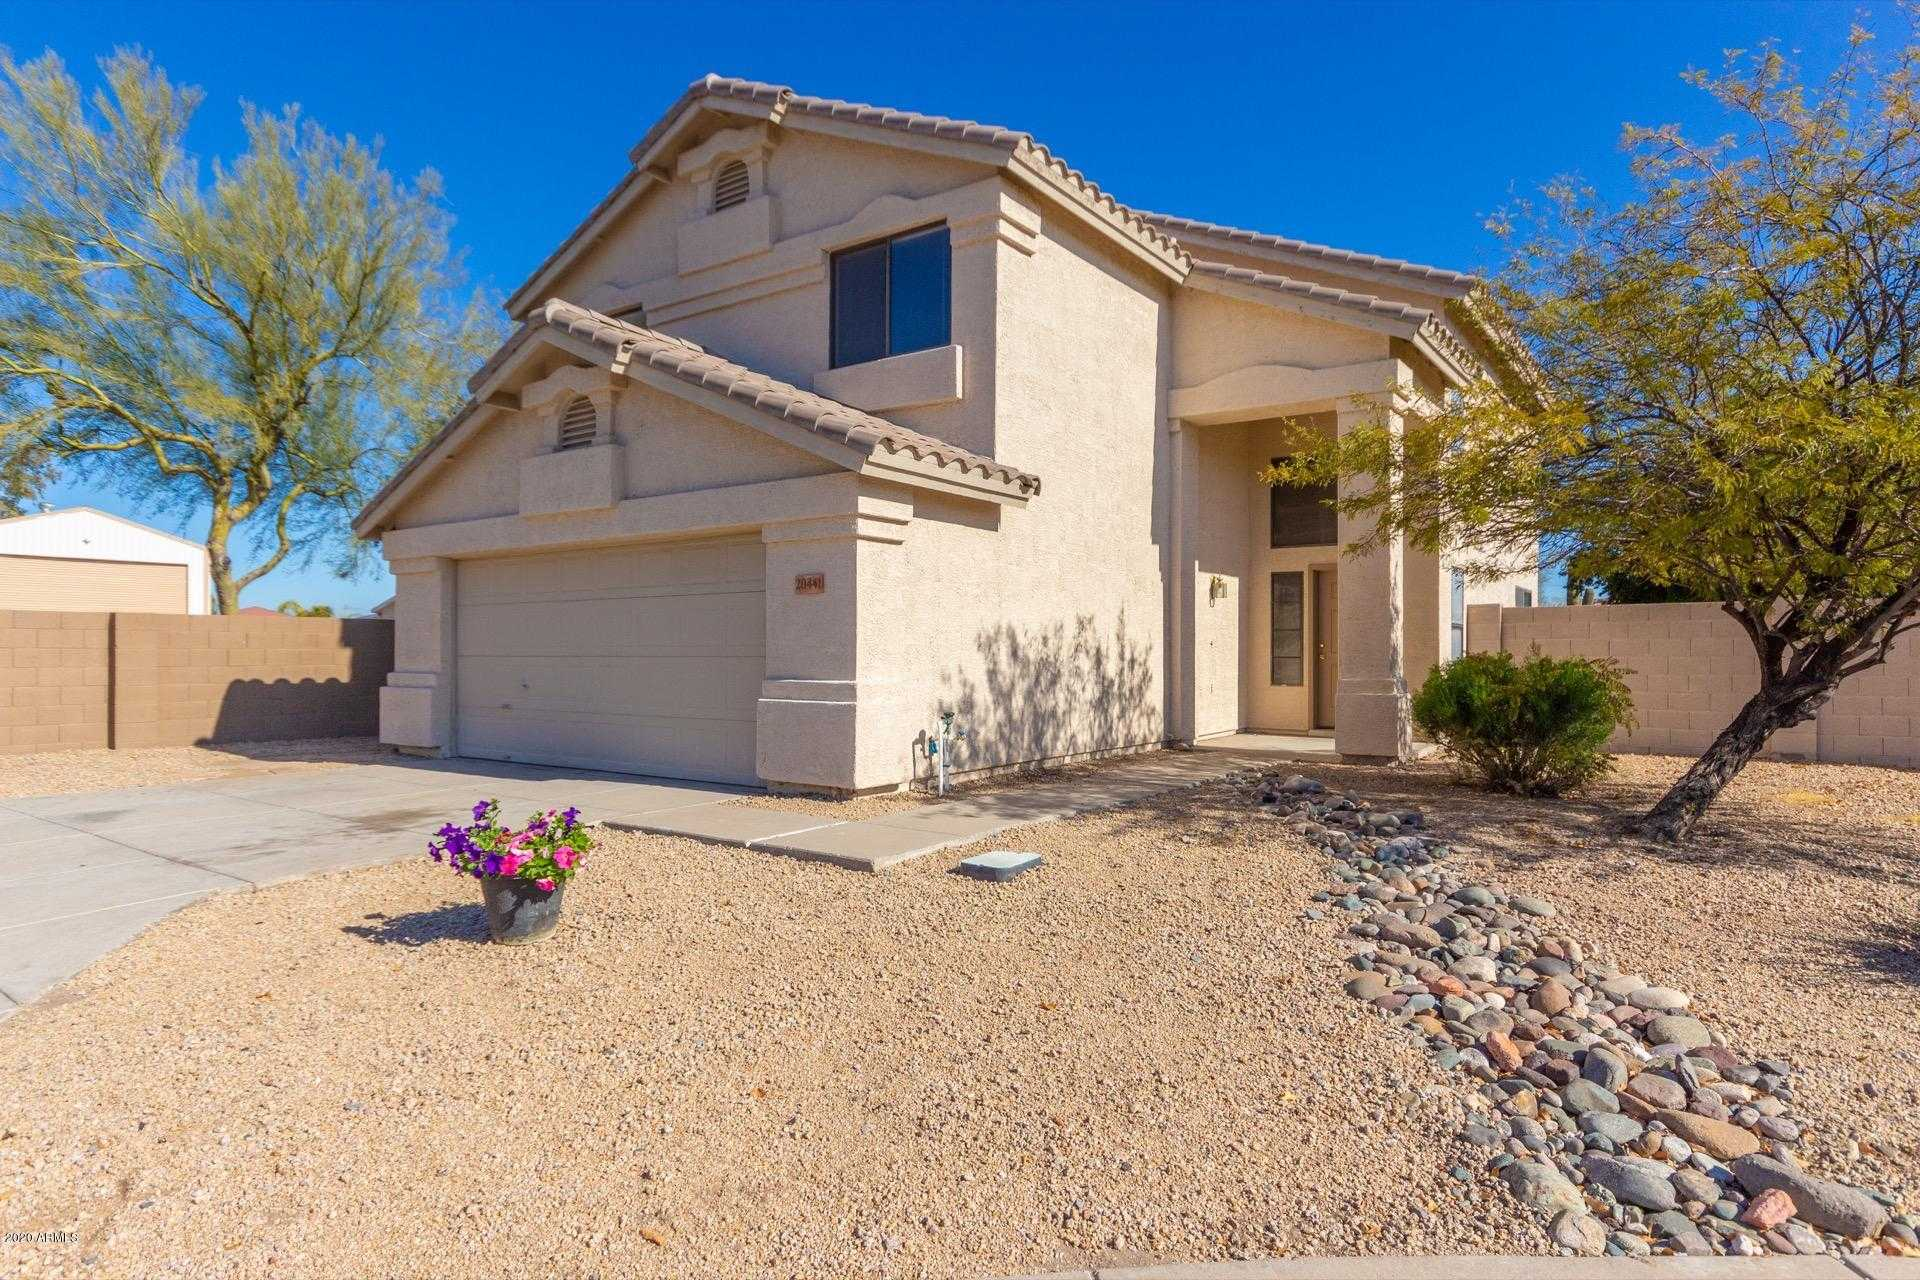 $318,000 - 4Br/3Ba - Home for Sale in Arroyo Springs Parcel C, Glendale